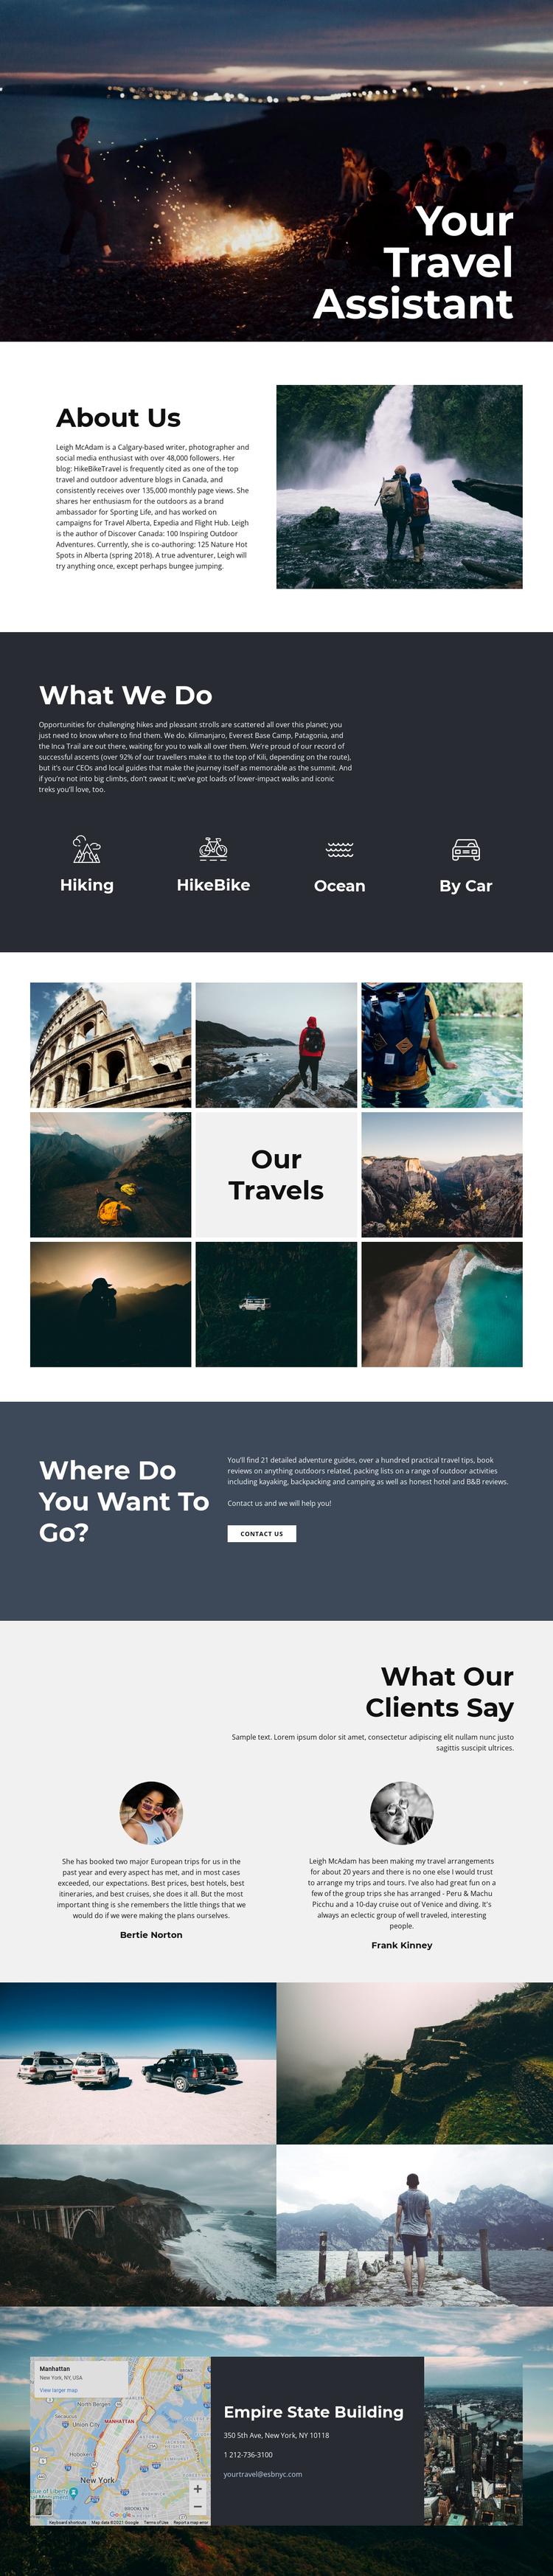 Travel Assistant Joomla Template